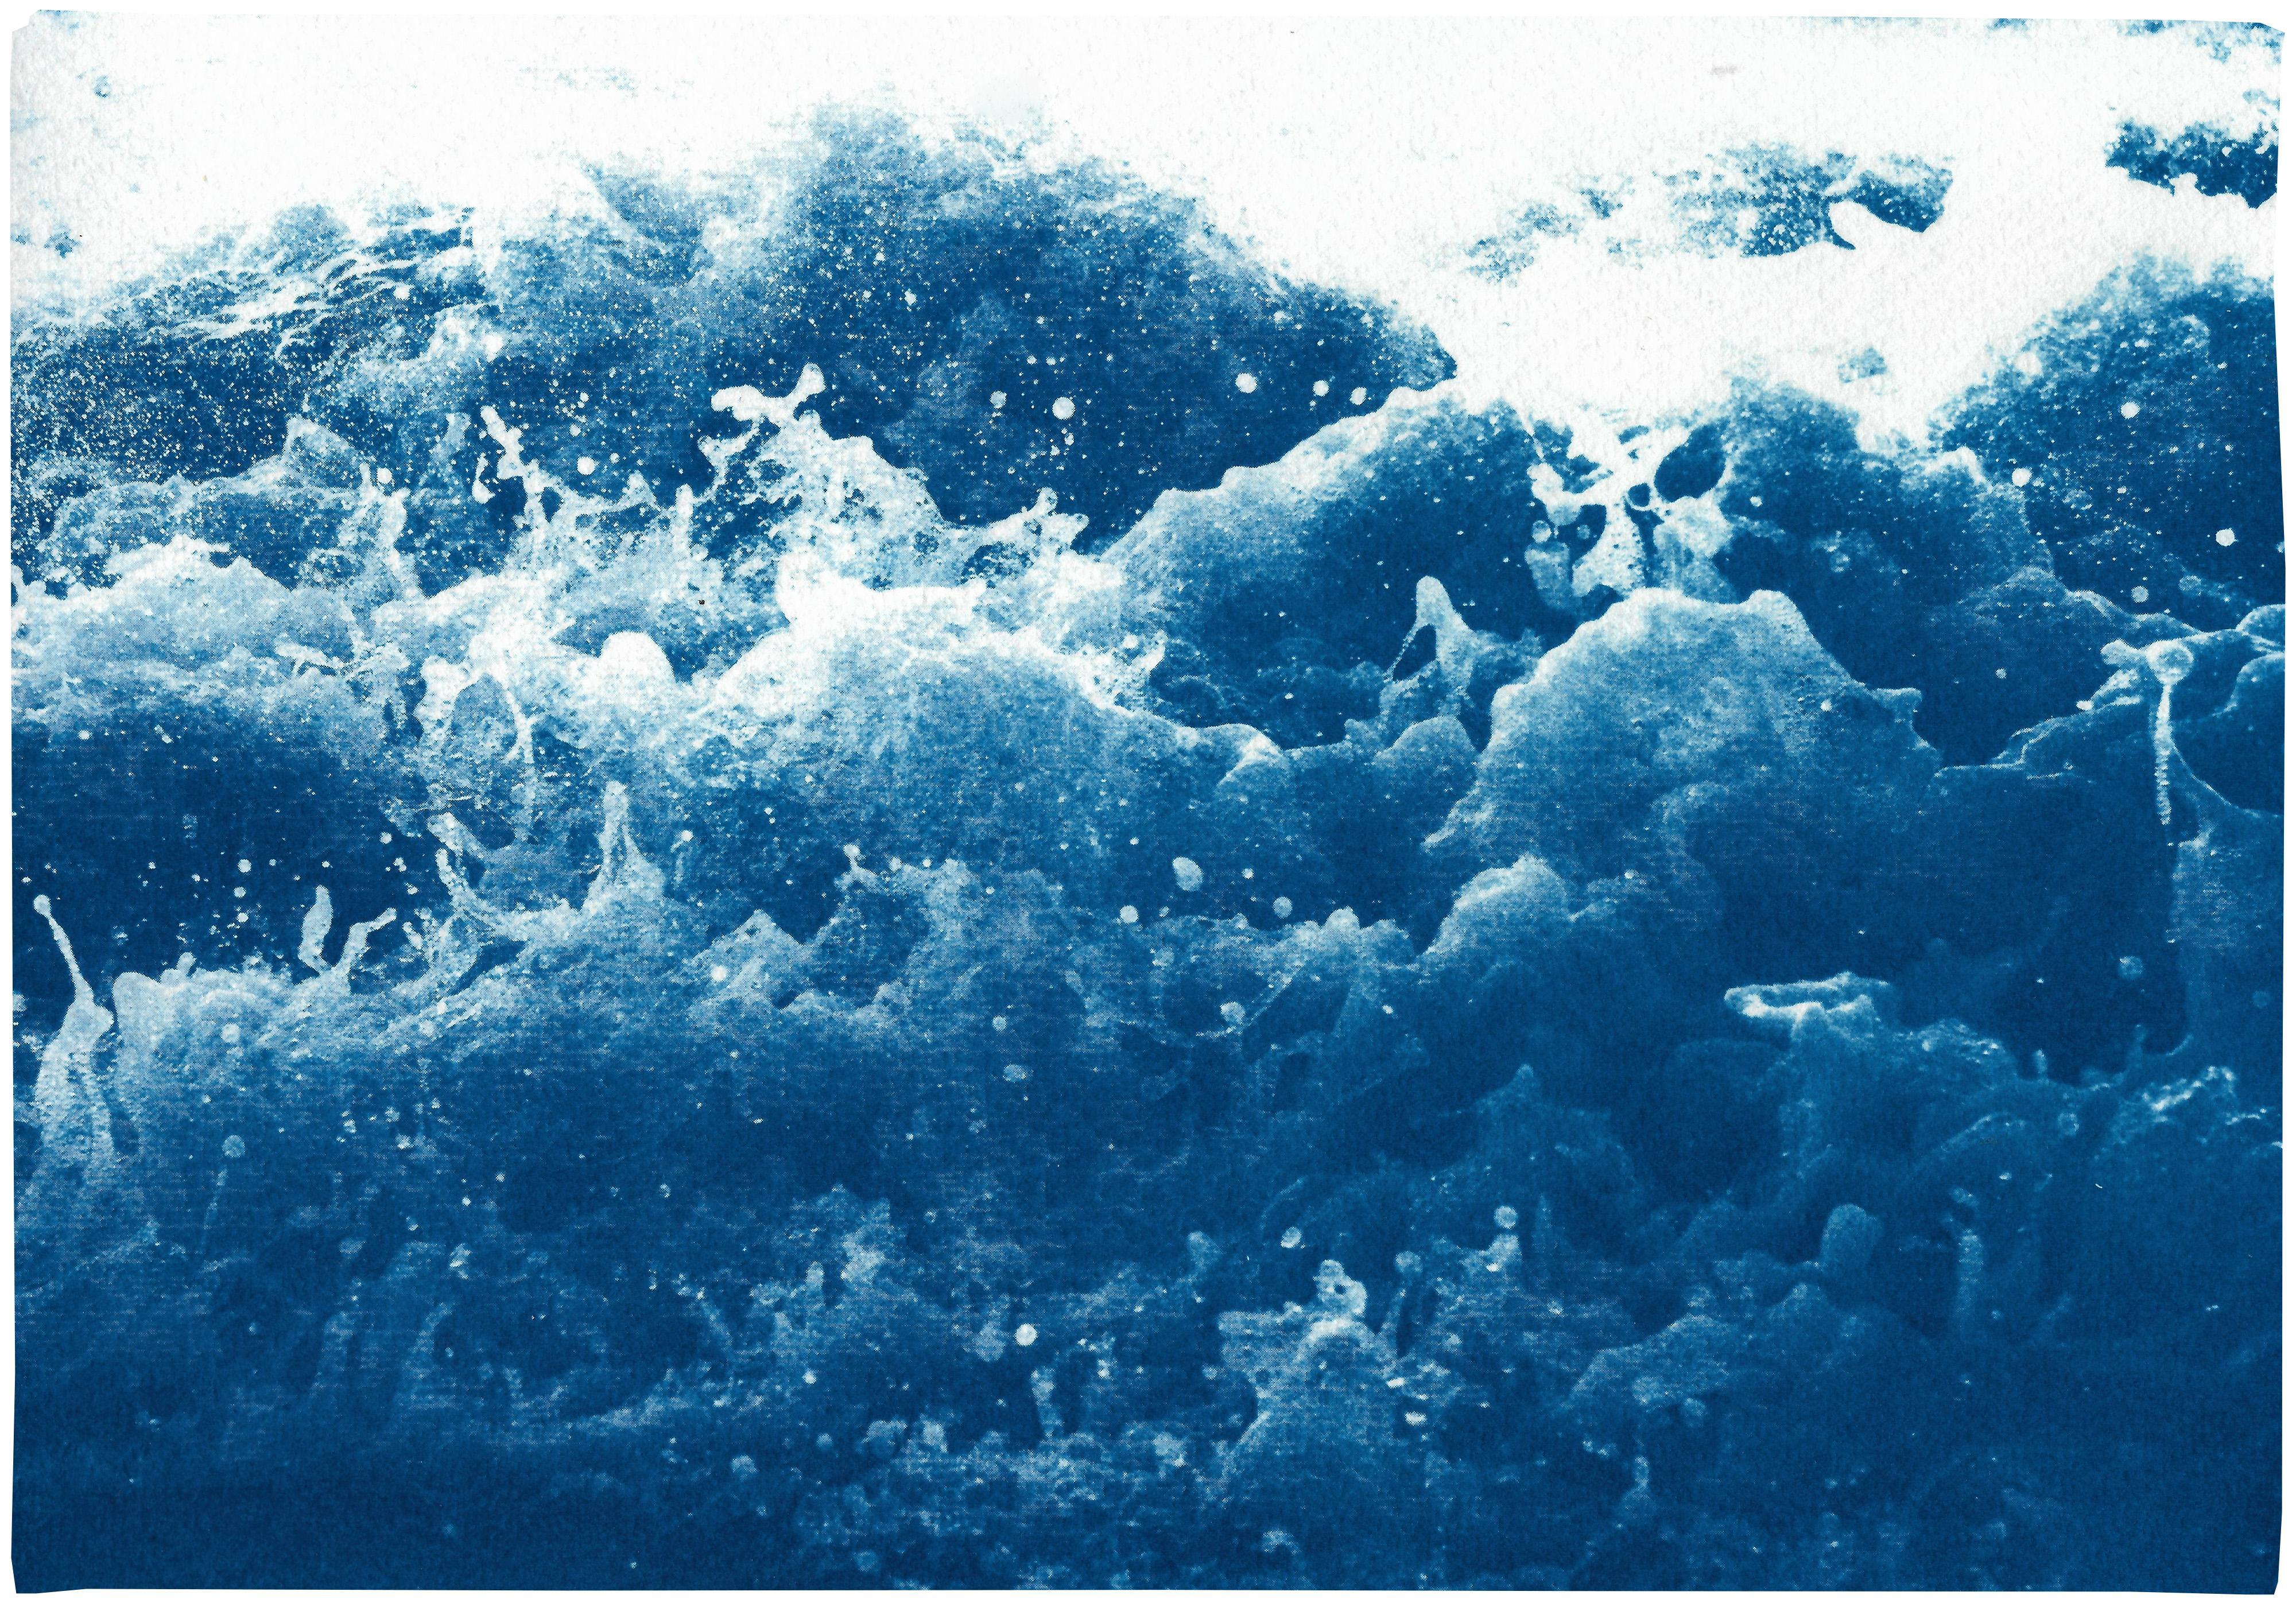 White and Blue Abstract Nautical Cyanotype of Crashing Waters, Coastal Lifestyle